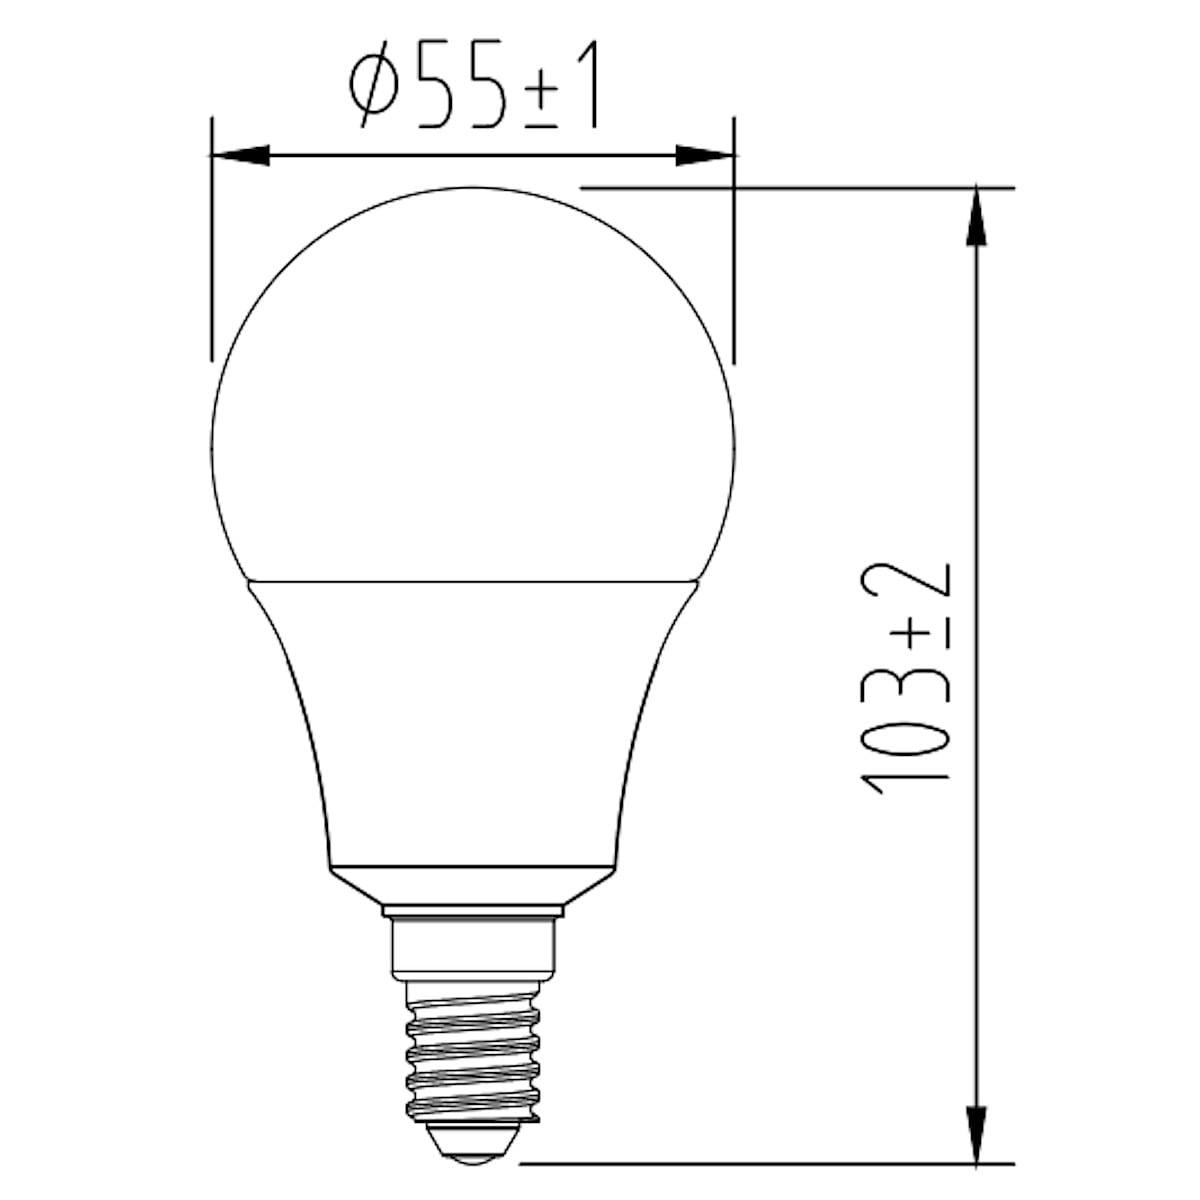 WiFi Smart Bulb E14 Clas Ohlson Home